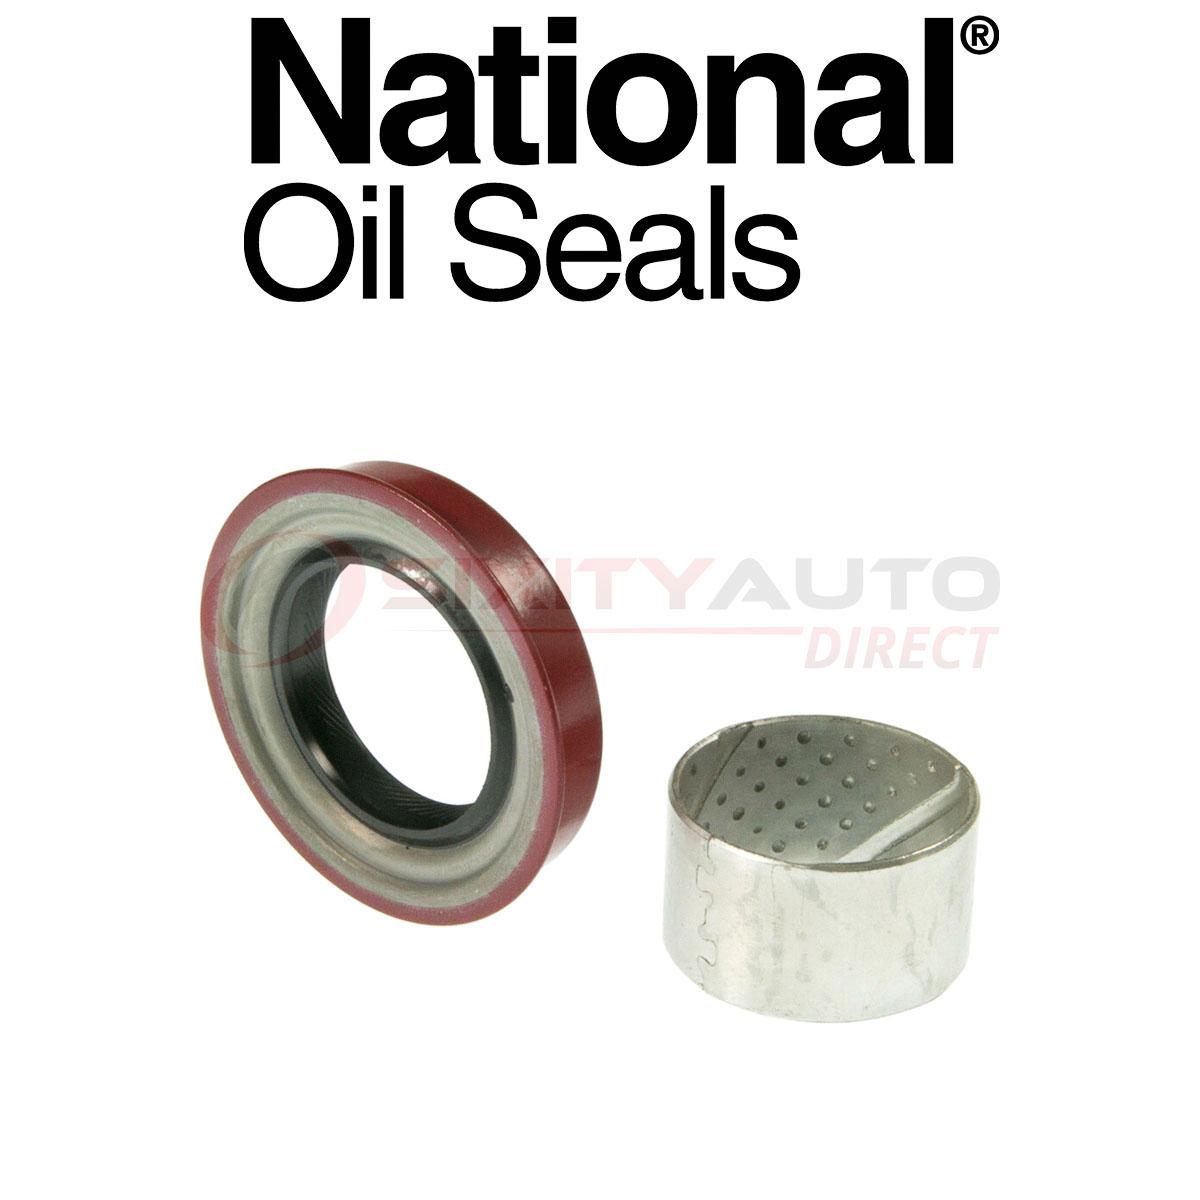 National Auto Trans Output Shaft Seal for 1995-1998 Nissan 200SX 1.6L 2.0L lt